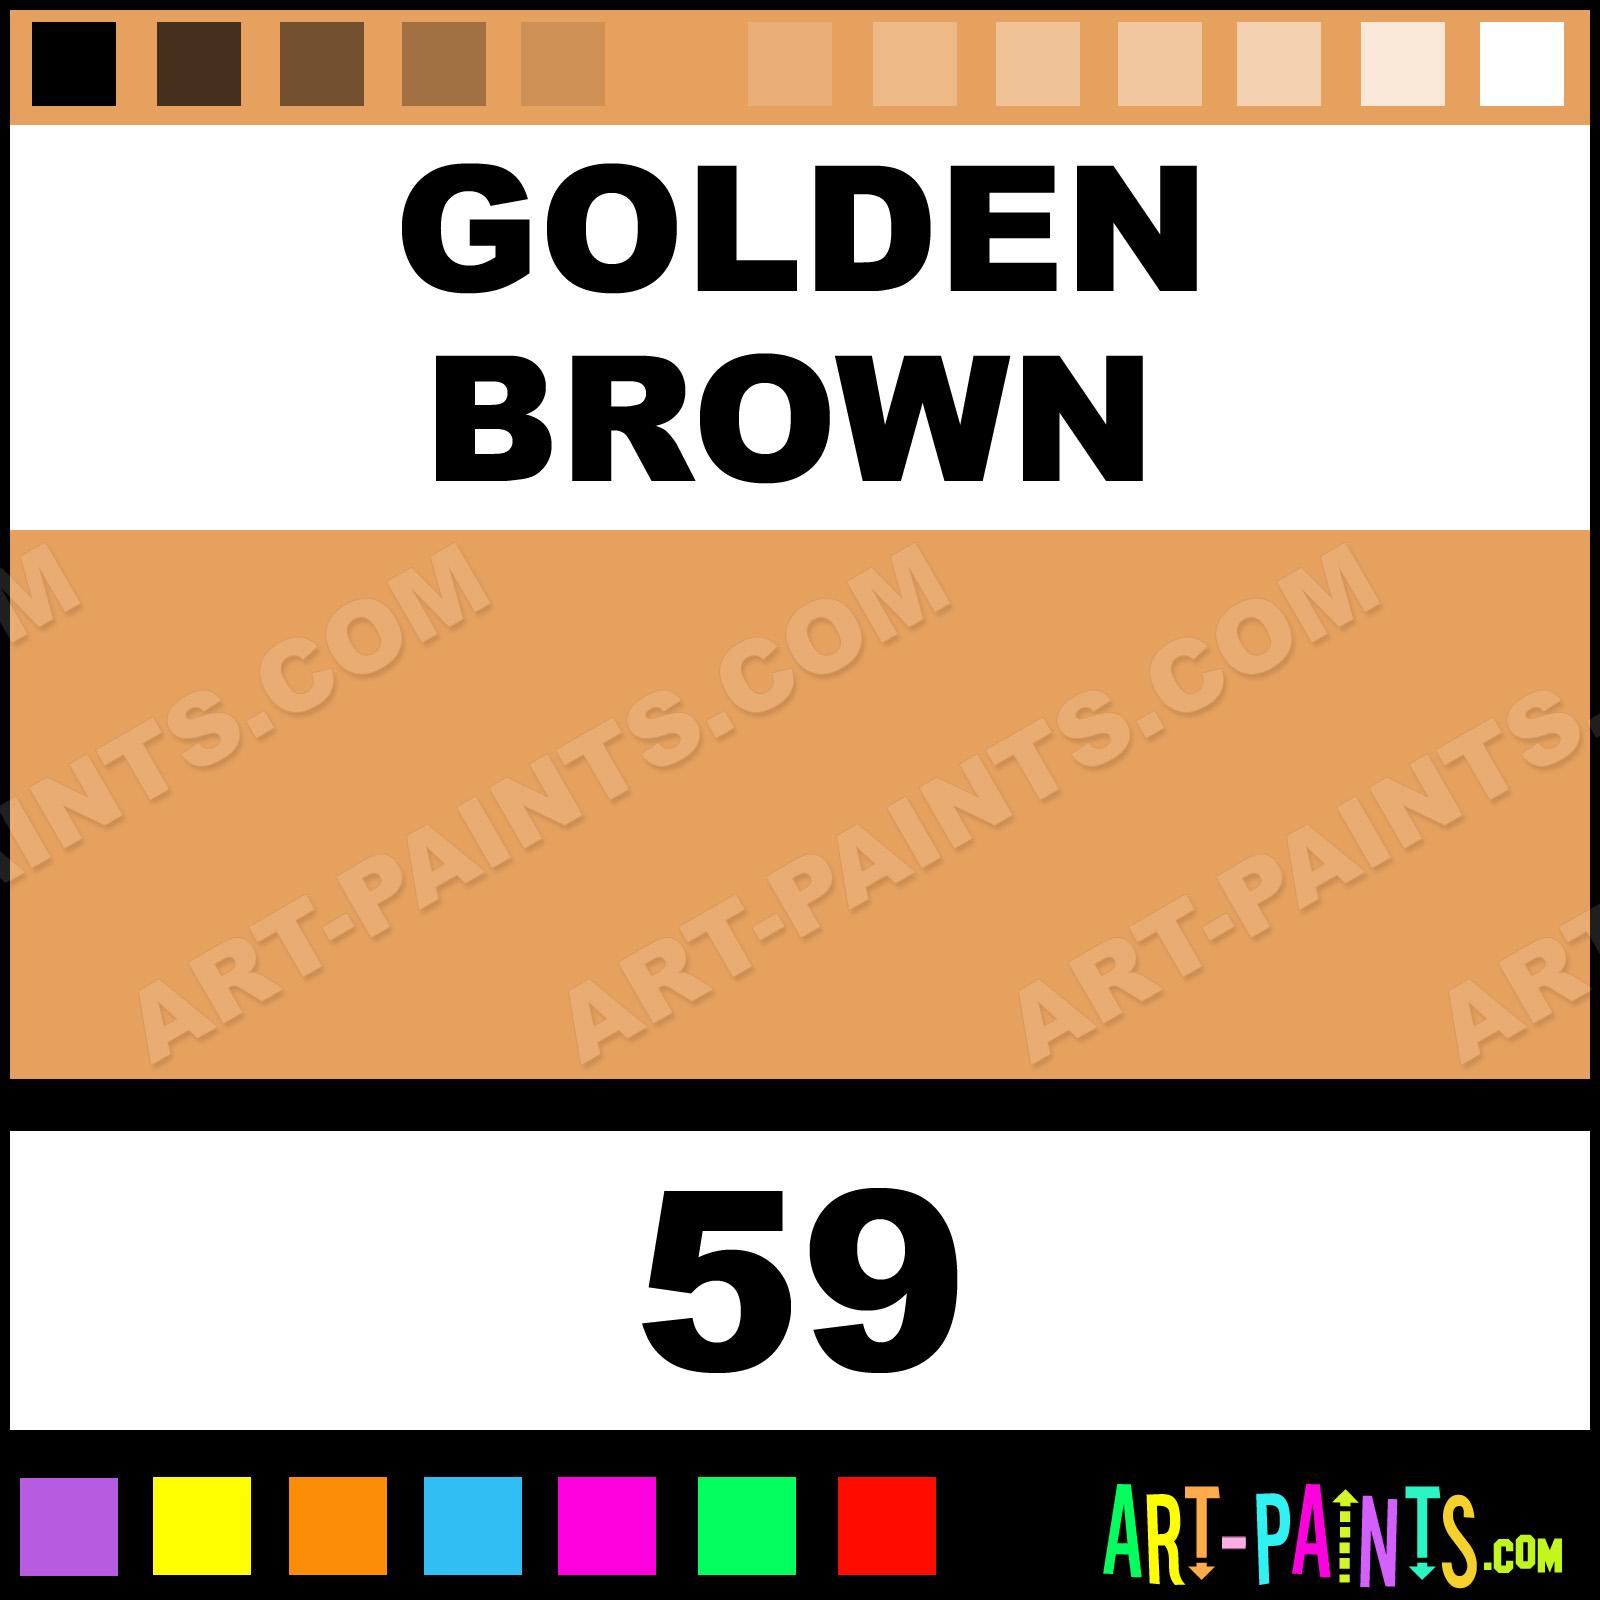 Derwent Paints Golden Brown Artist Watercolor